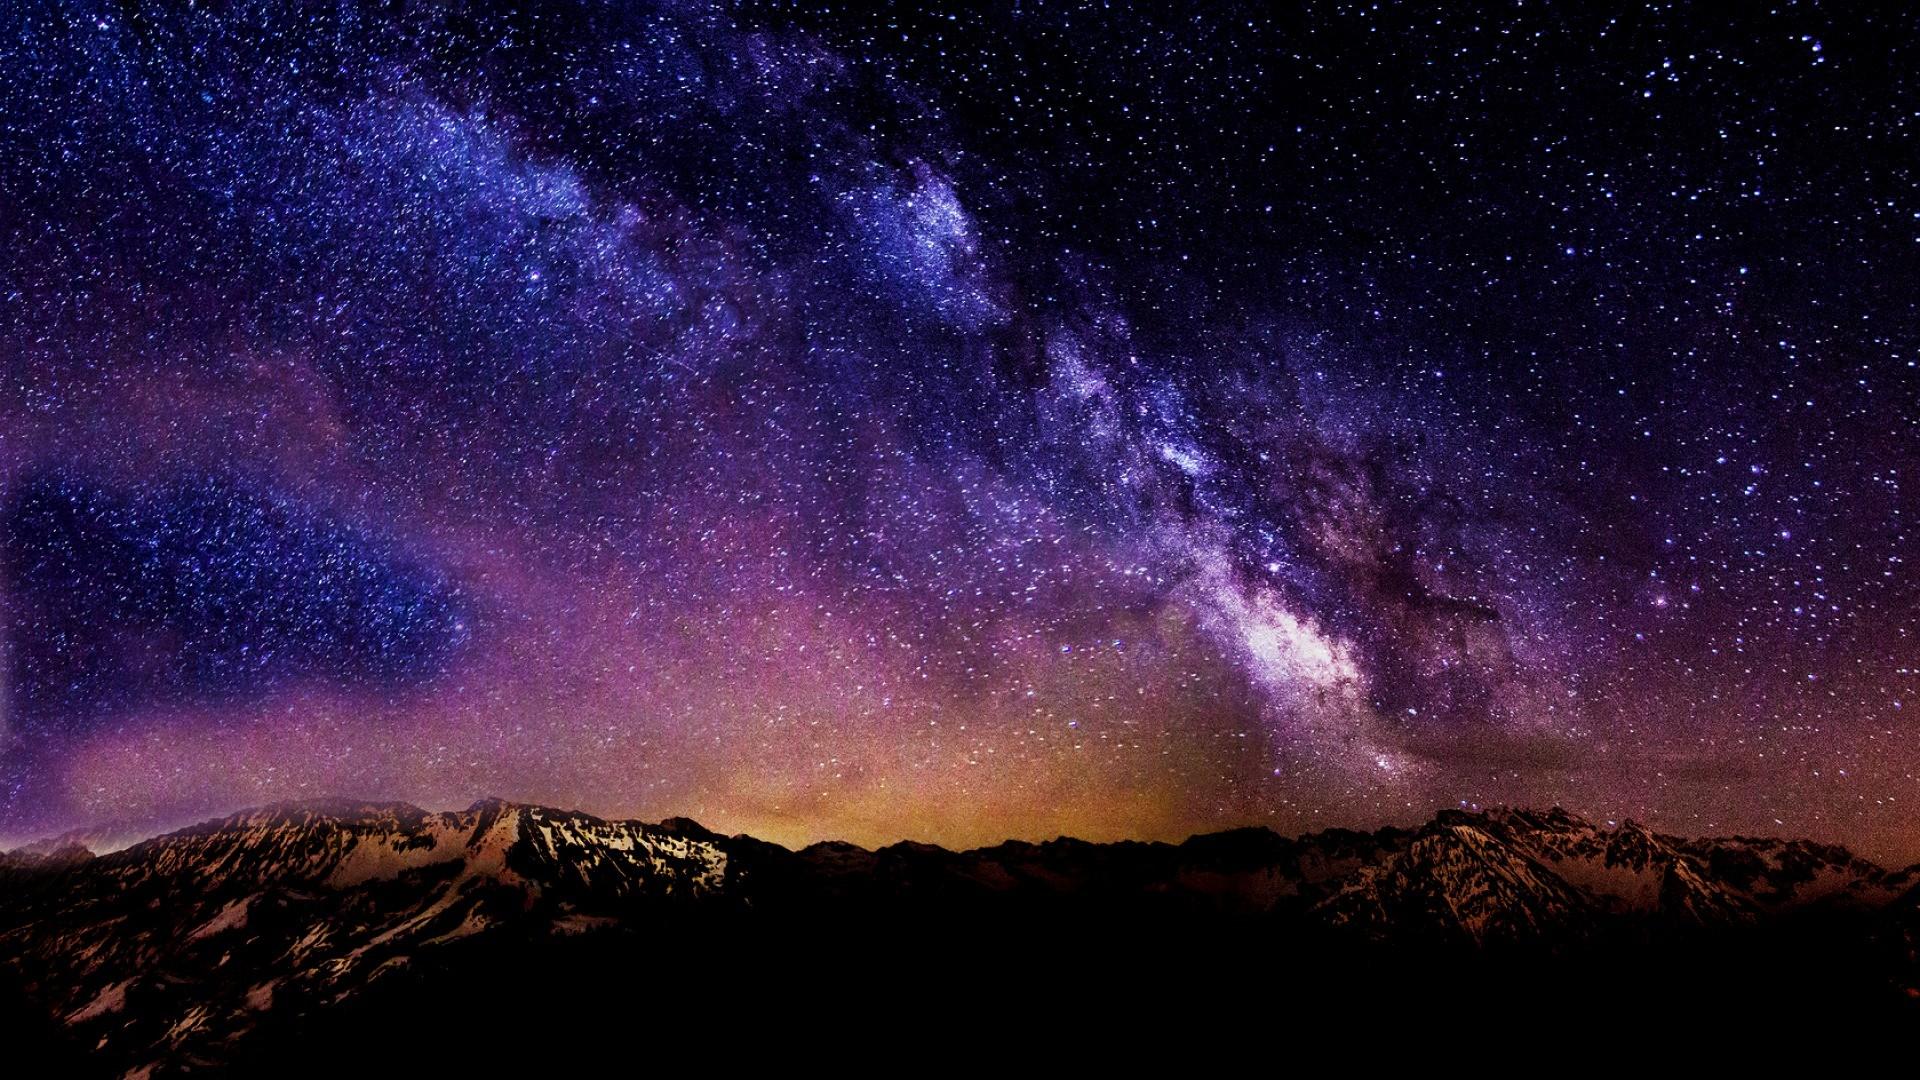 Starry Night. Amazing Starry Night Hd Desktop Background Wallpapers Free  1920x1200px